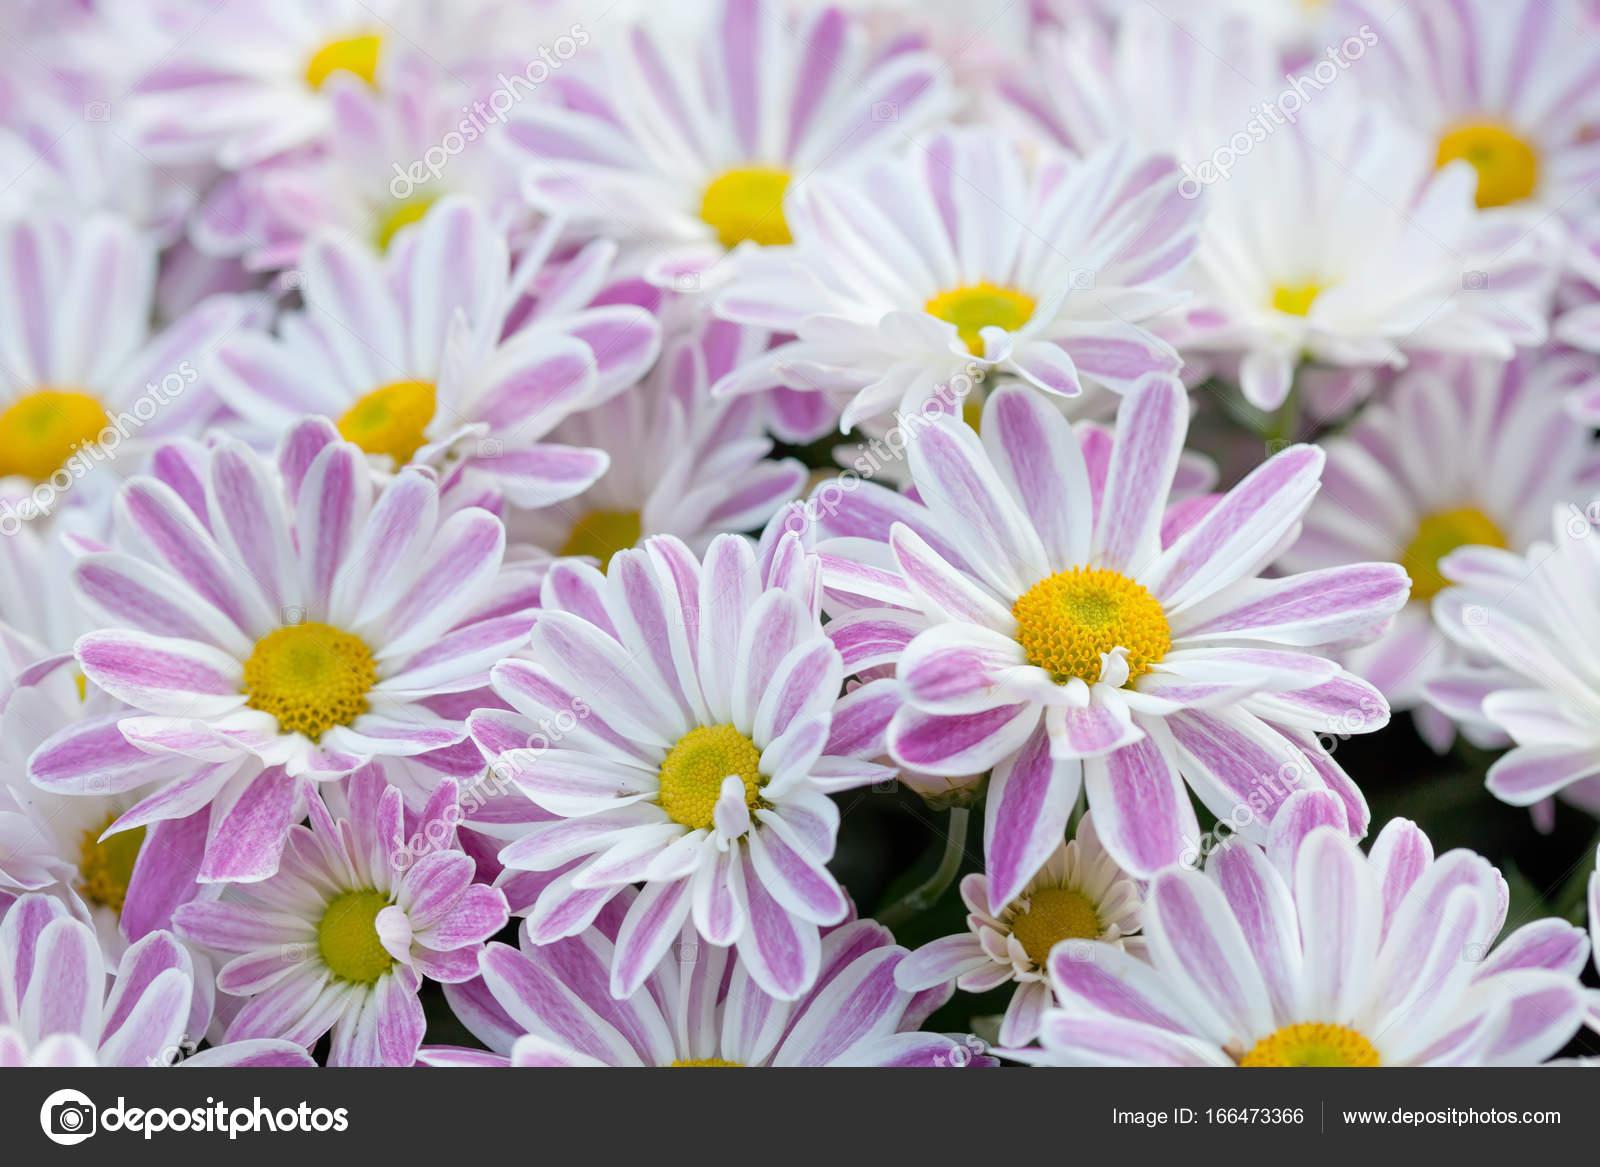 Violet chrysanthemums floral background colorful white pink yellow violet chrysanthemums floral background colorful white pink yellow mums flowers stock photo mightylinksfo